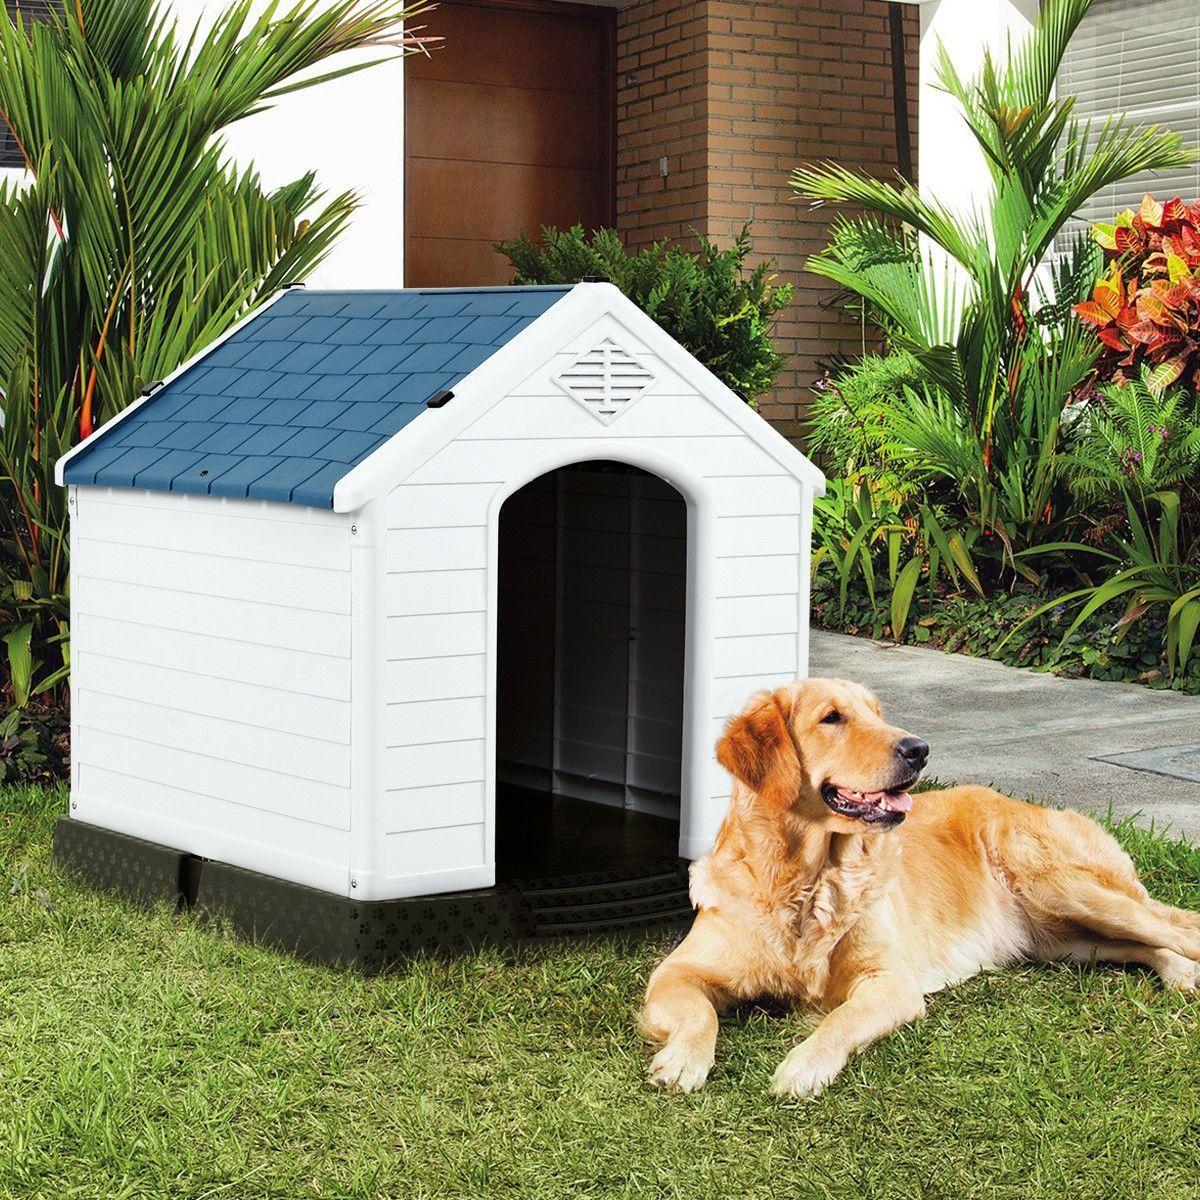 Plastic Waterproof Ventilate Pet Puppy House In 2020 Plastic Dog House Outdoor Dog House Shelter Puppies